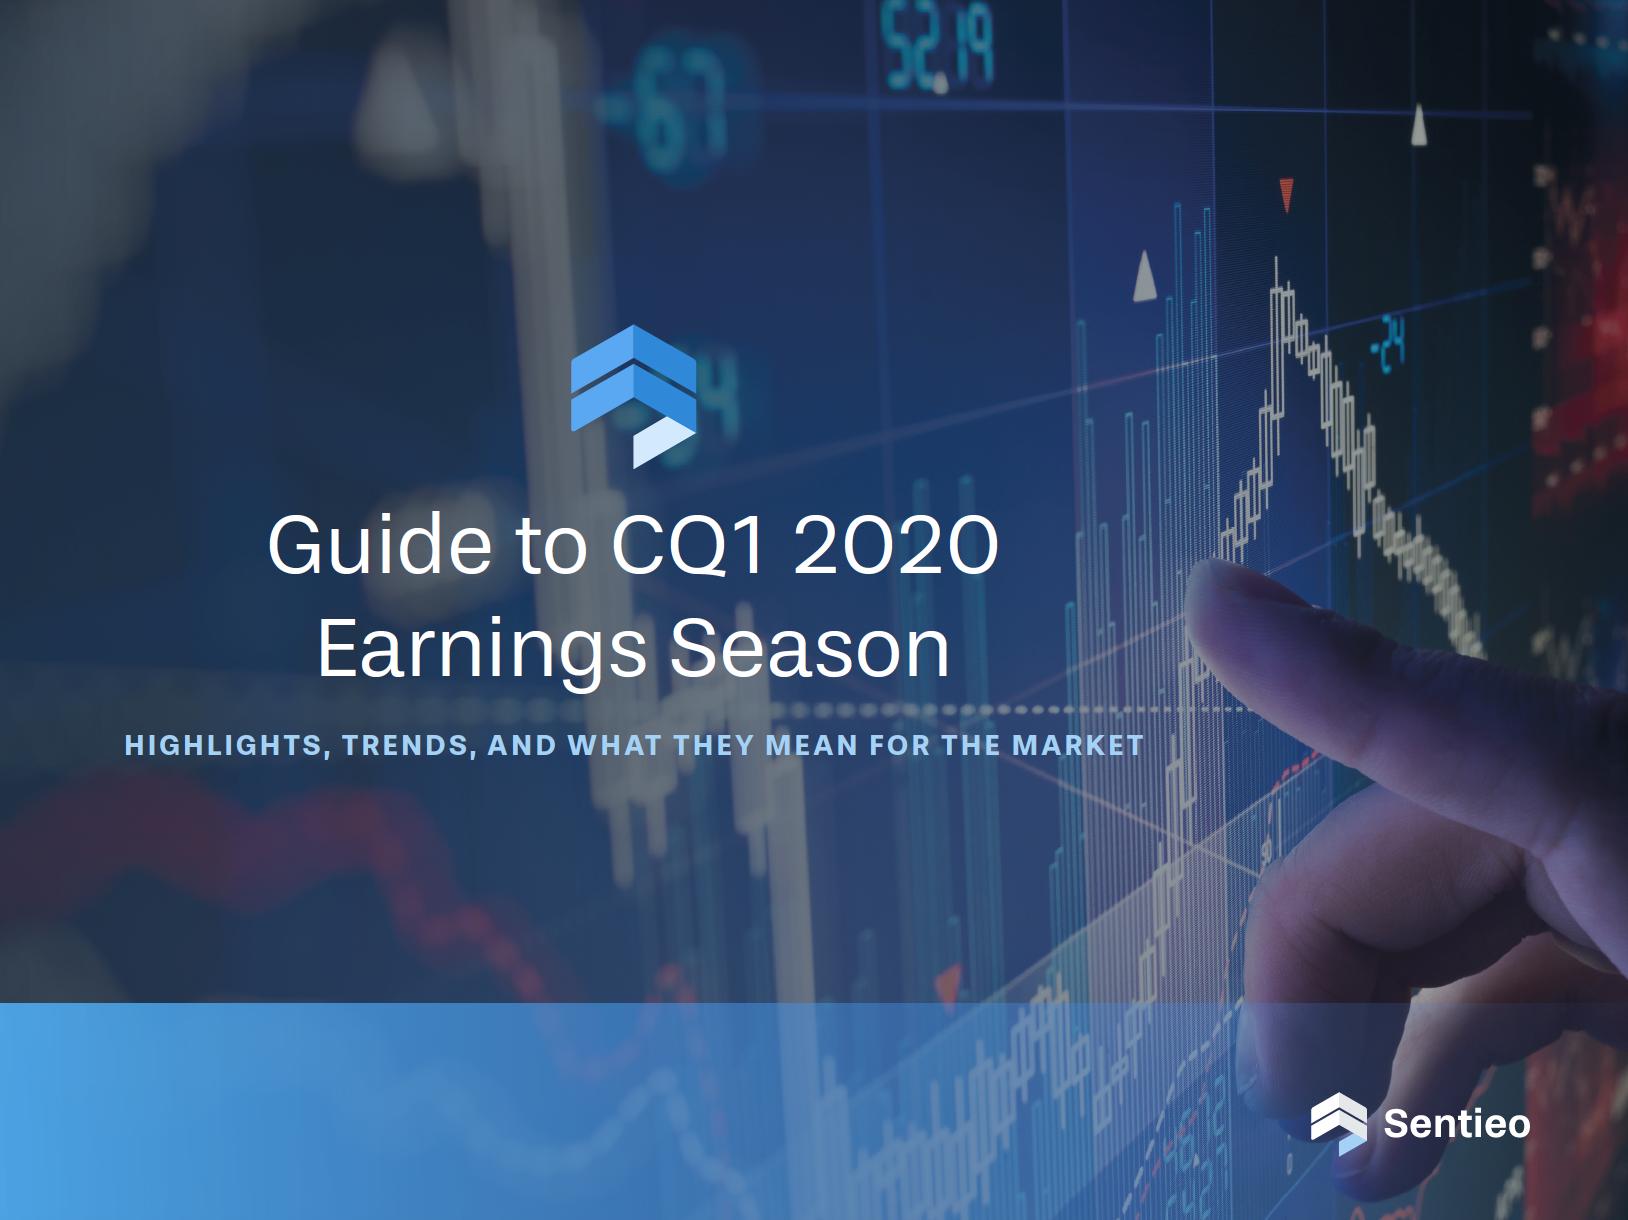 Guide to CQ1 2020 Earnings Season Cover